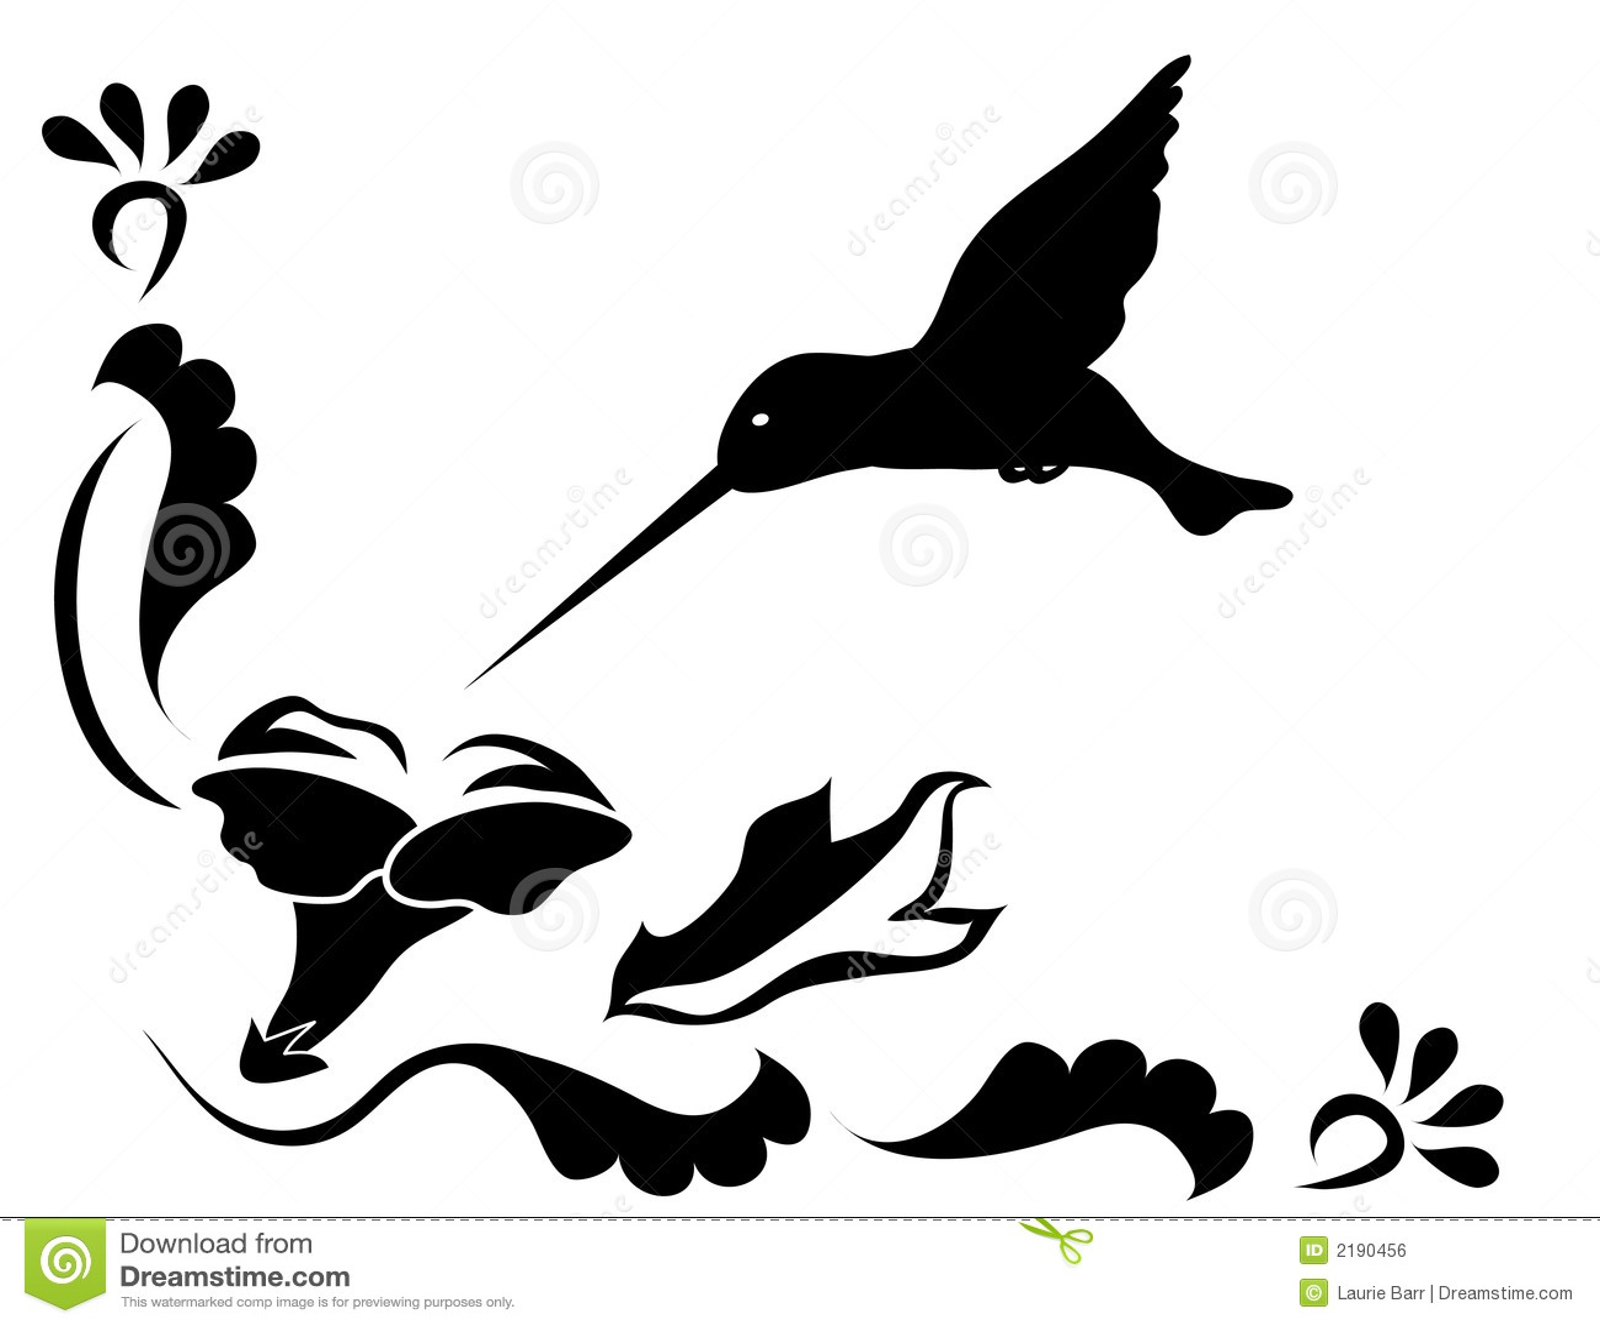 Humming Bird Royalty Free Stock Image